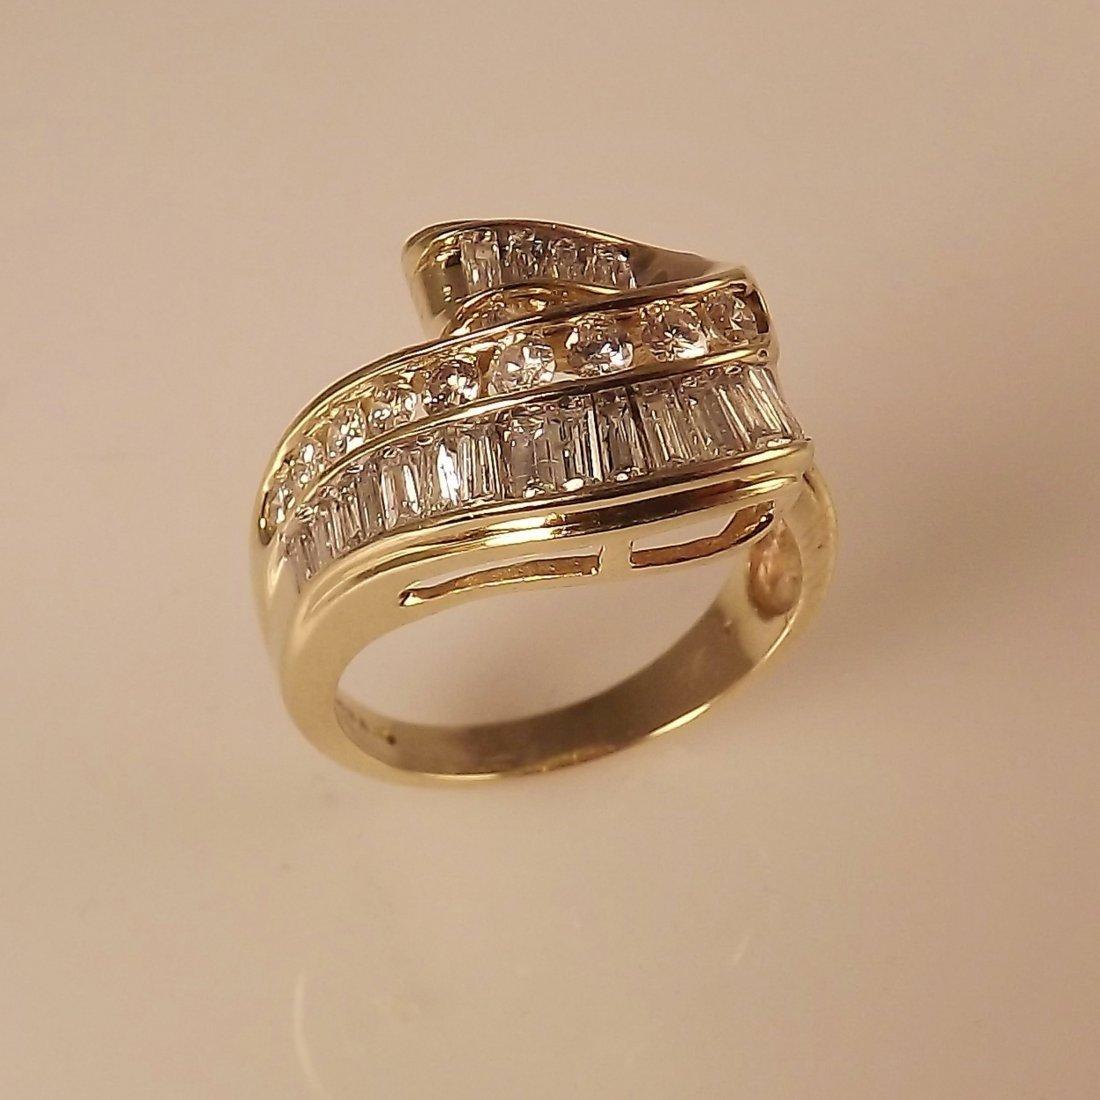 14K Y.G Swirl Design Ring with 2.0ctw Diamonds -